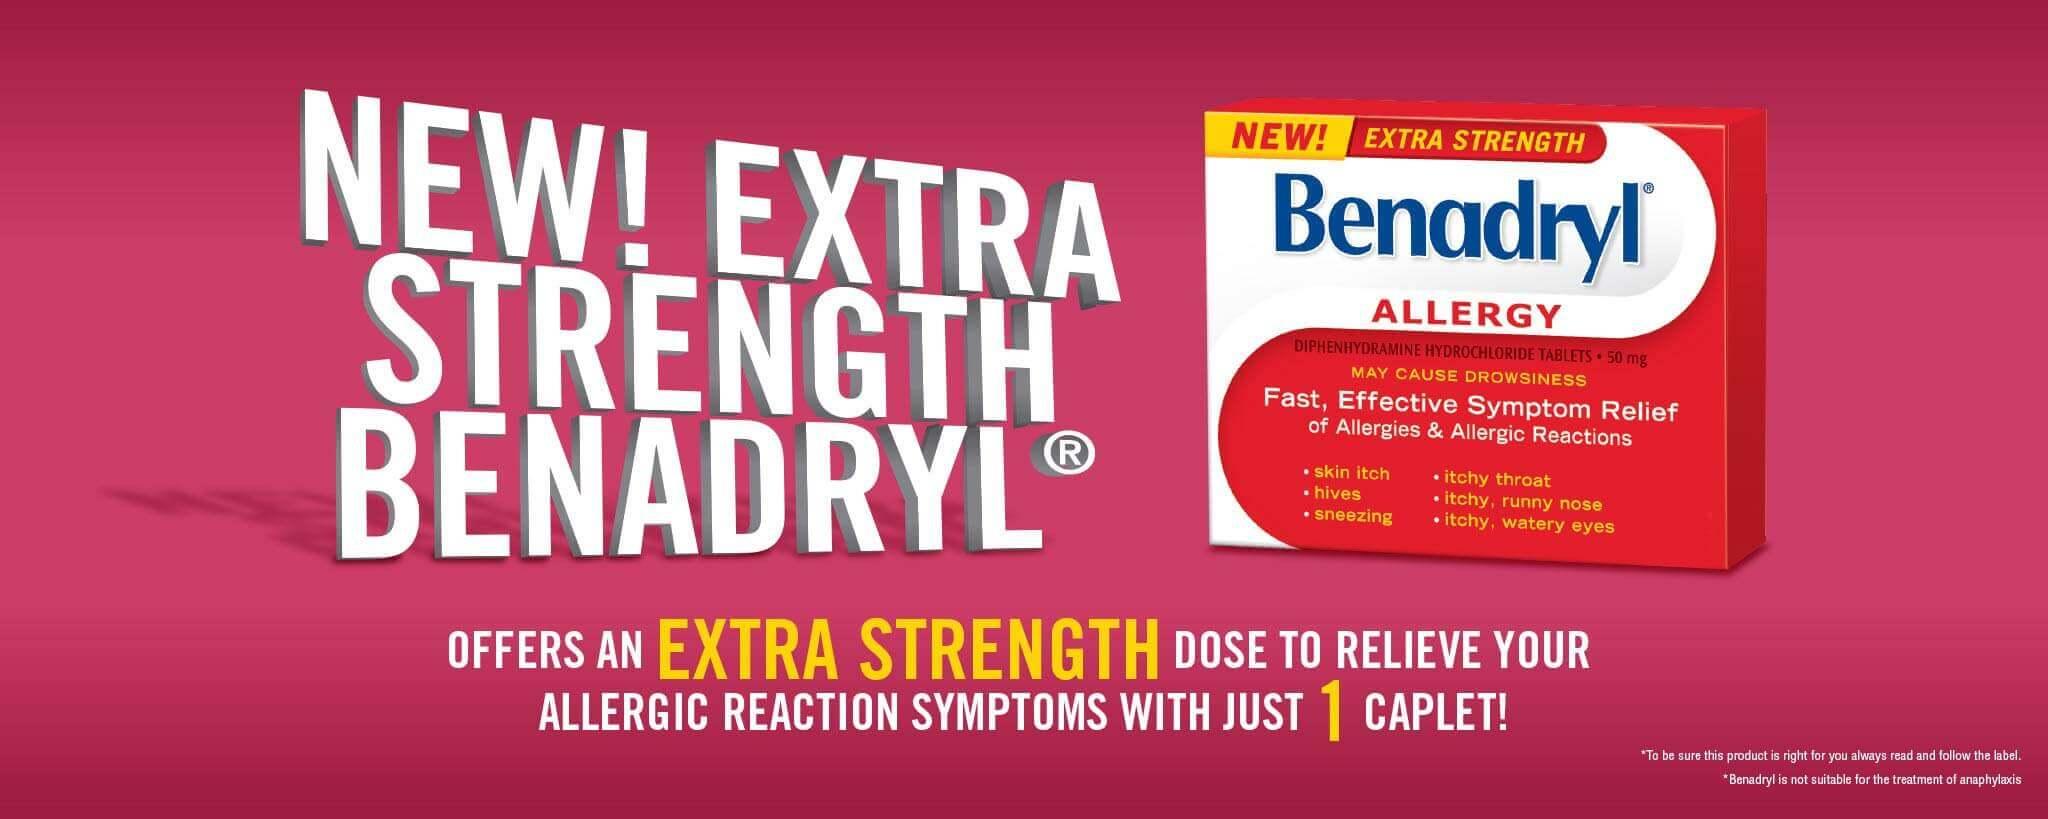 Extra Strength BENADRYL®